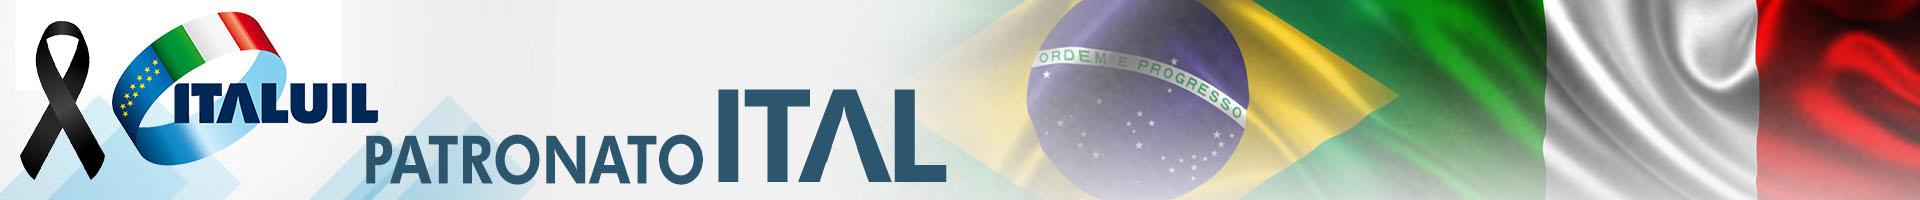 Patronato Ital UIL